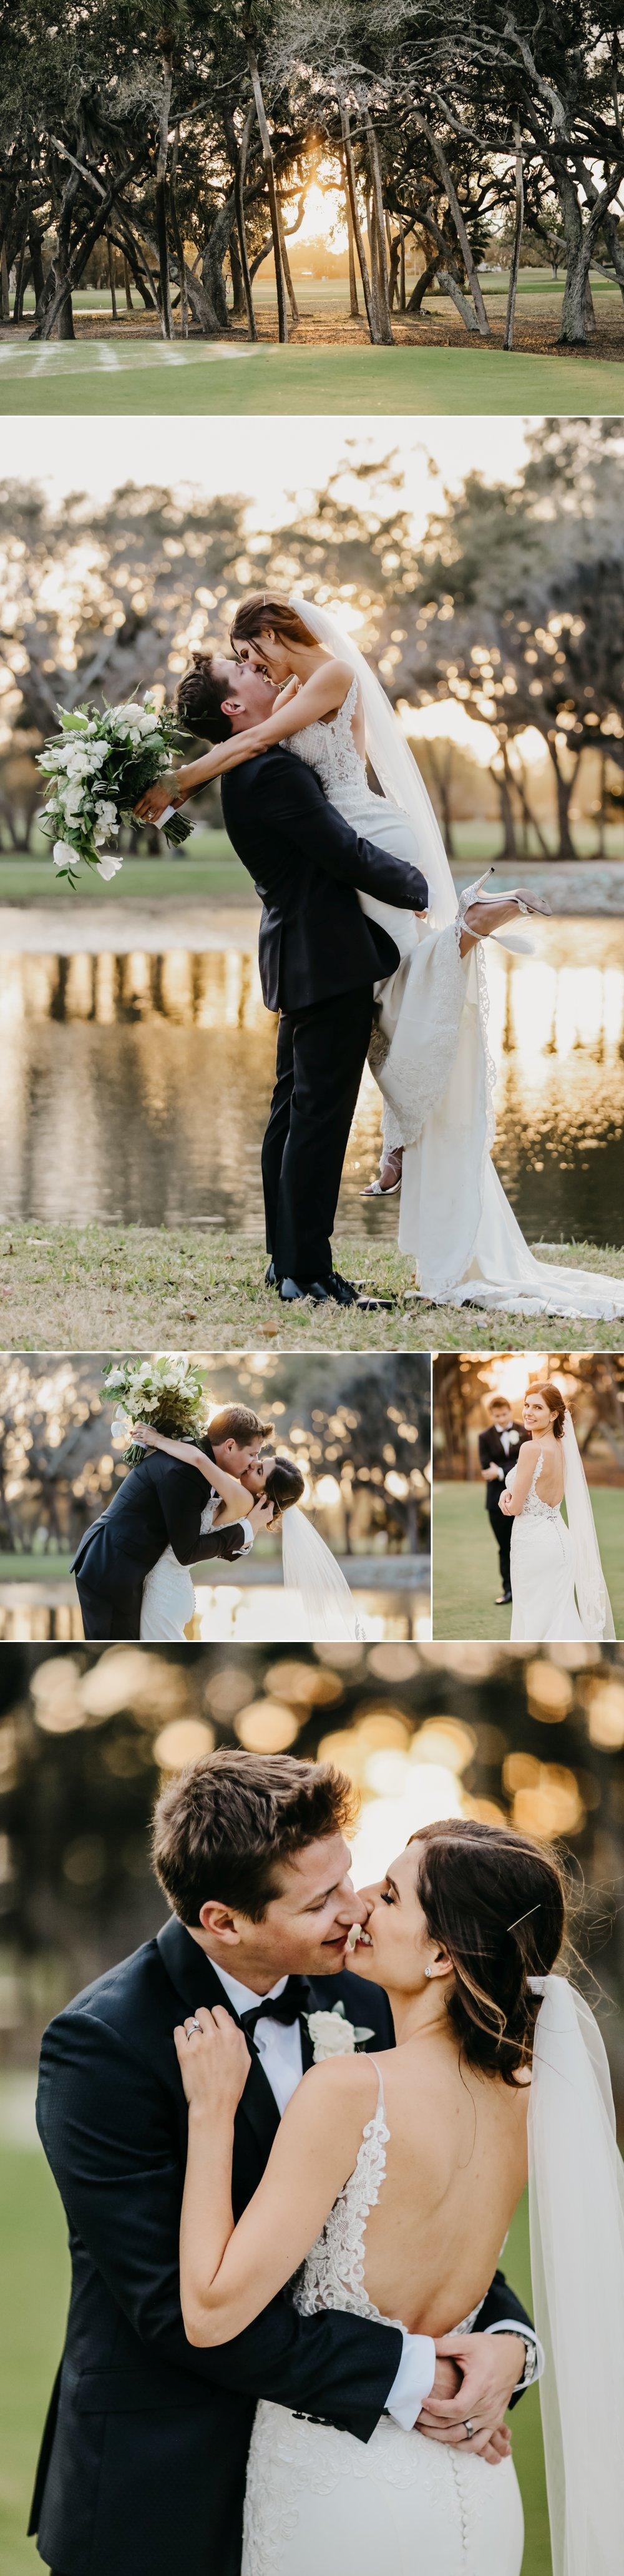 Luxe_tropical_travel_destination_wedding_photography_ShainaDeCiryan.com22.jpg